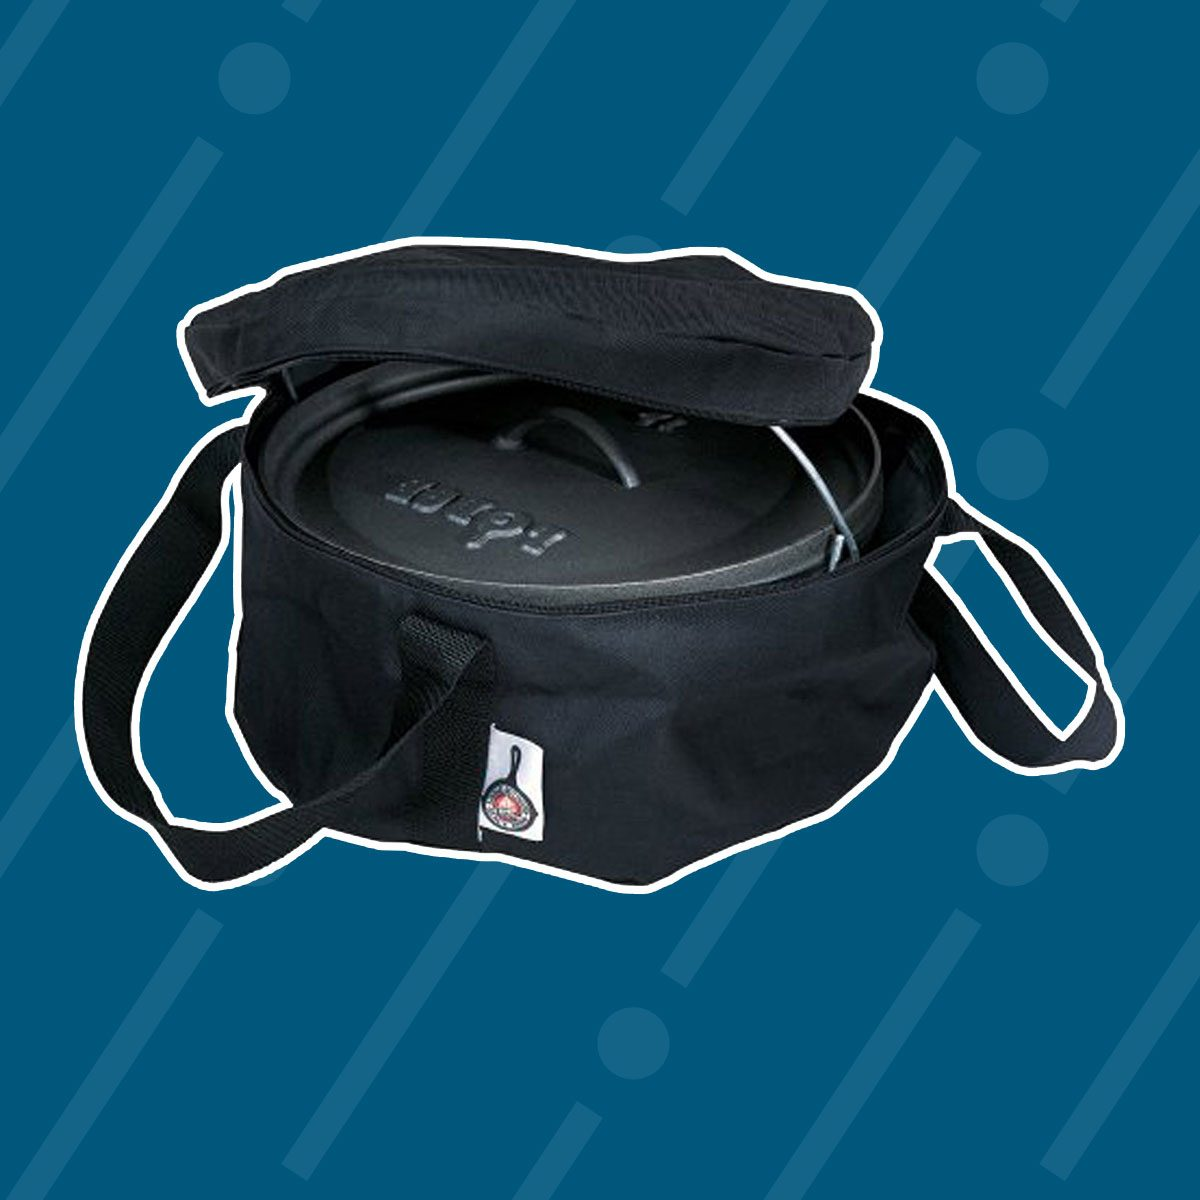 Lodge Camp 12-Inch Dutch Oven Tote Bag